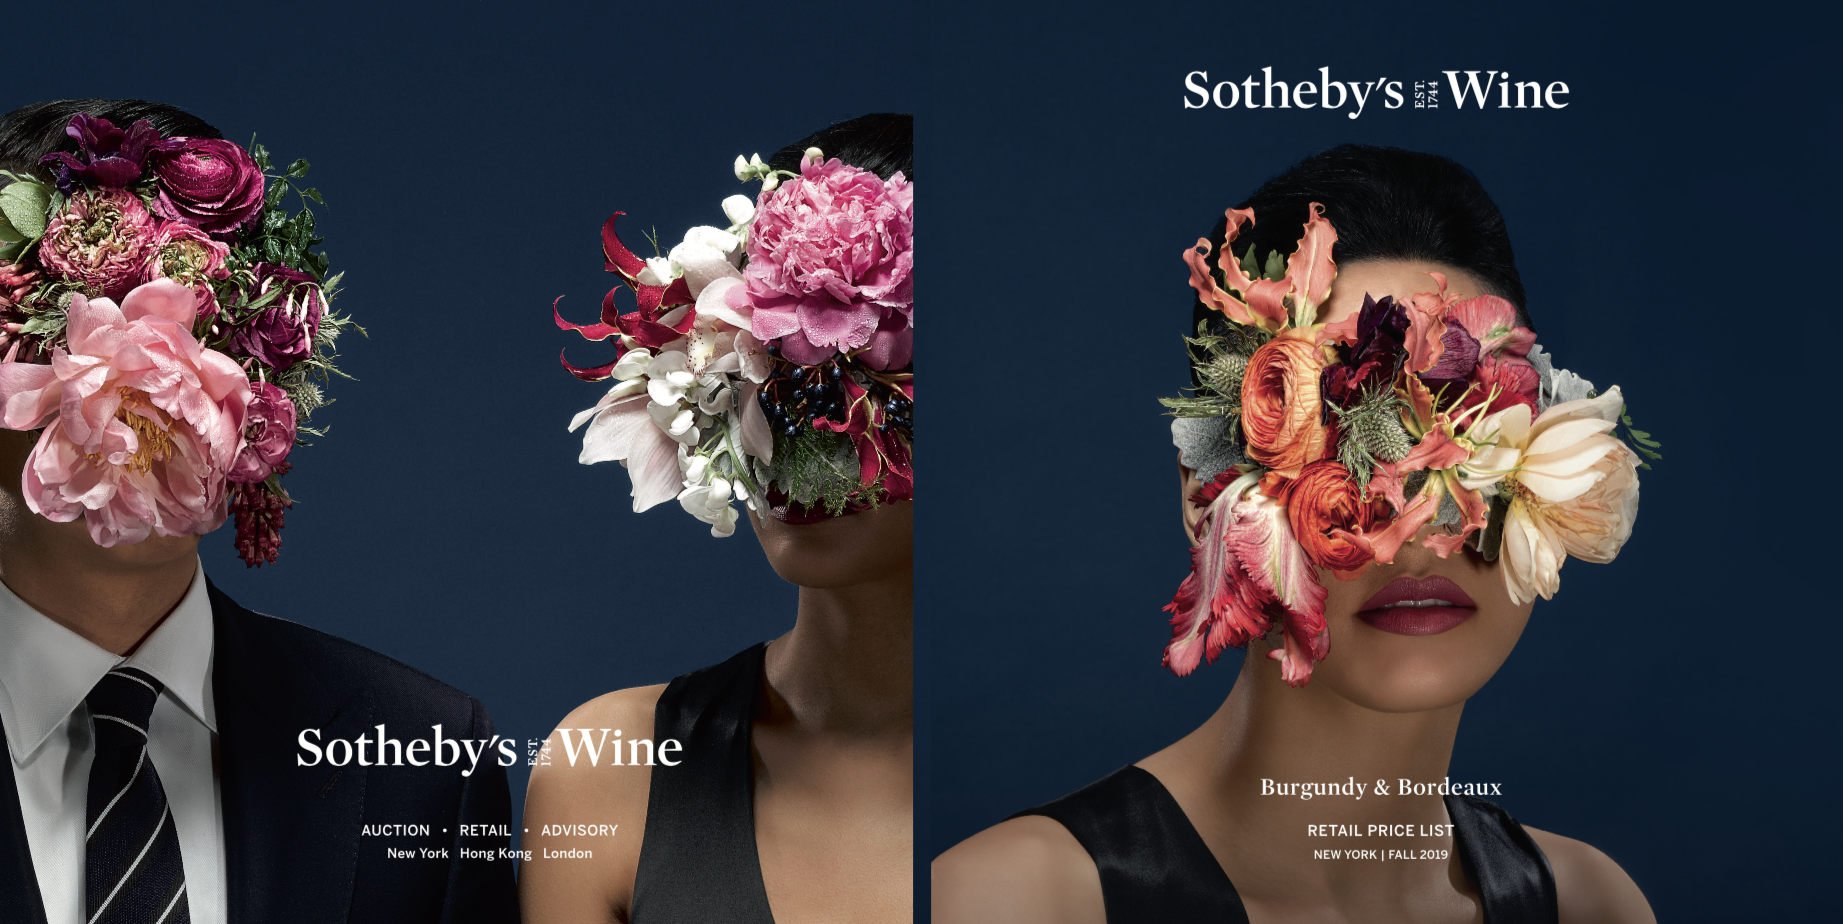 Sothebys Wine Fall Ad Campaign 9.2019 Floral Stylist Judy Kim Hair Makeup Sasha Safdiah Photo Ber Murphy Art Director Ana Lucia Rosales Boujnah